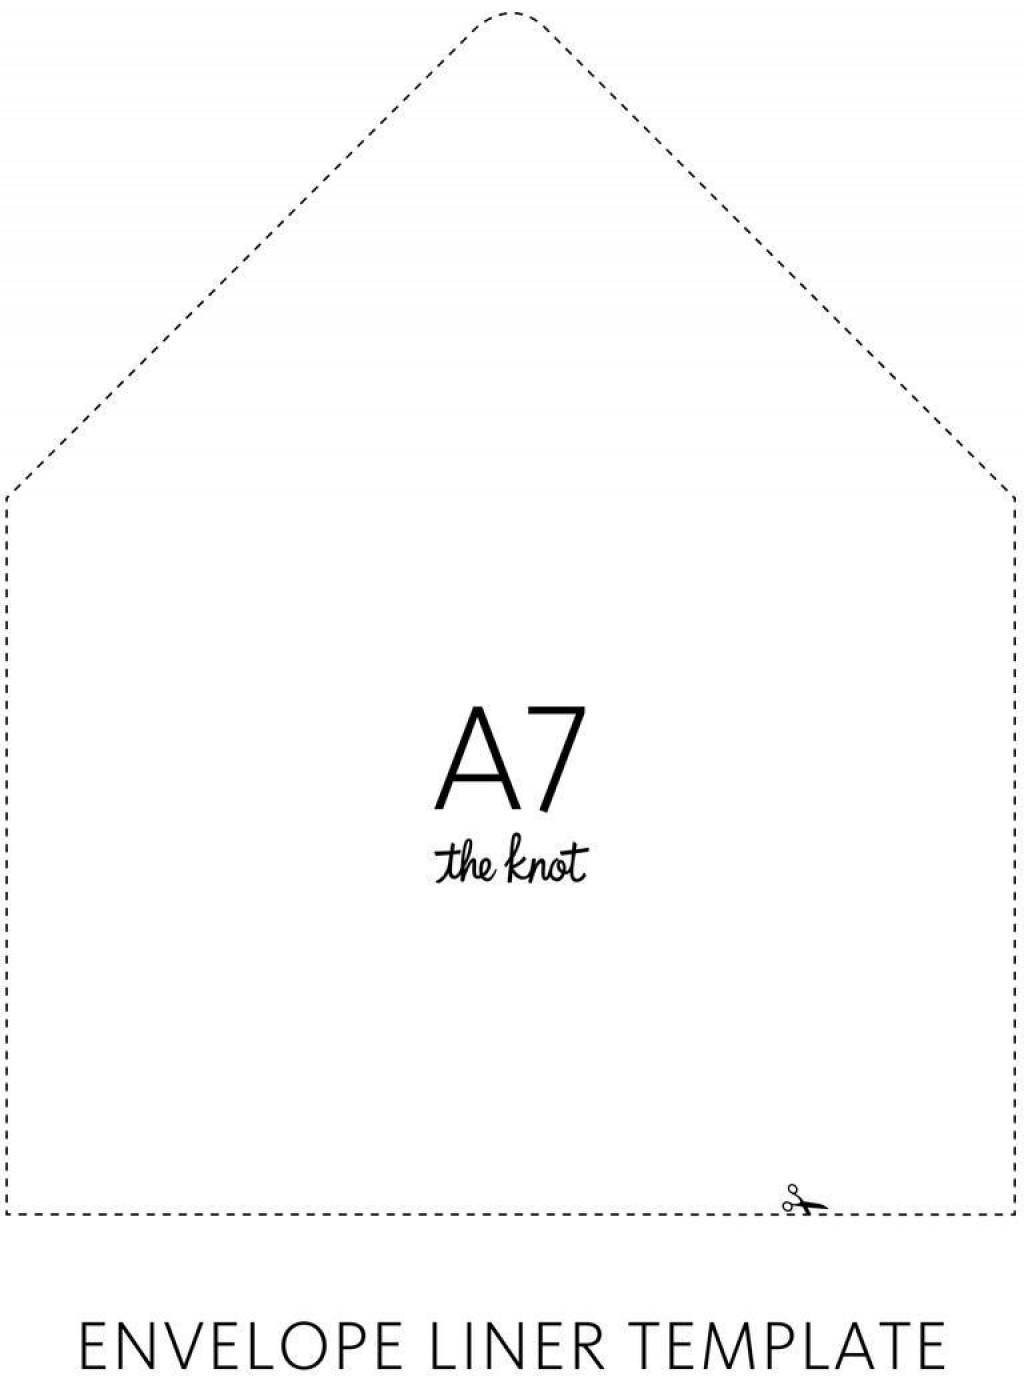 002 Marvelou A7 Envelope Liner Template Square Flap Inspiration Large